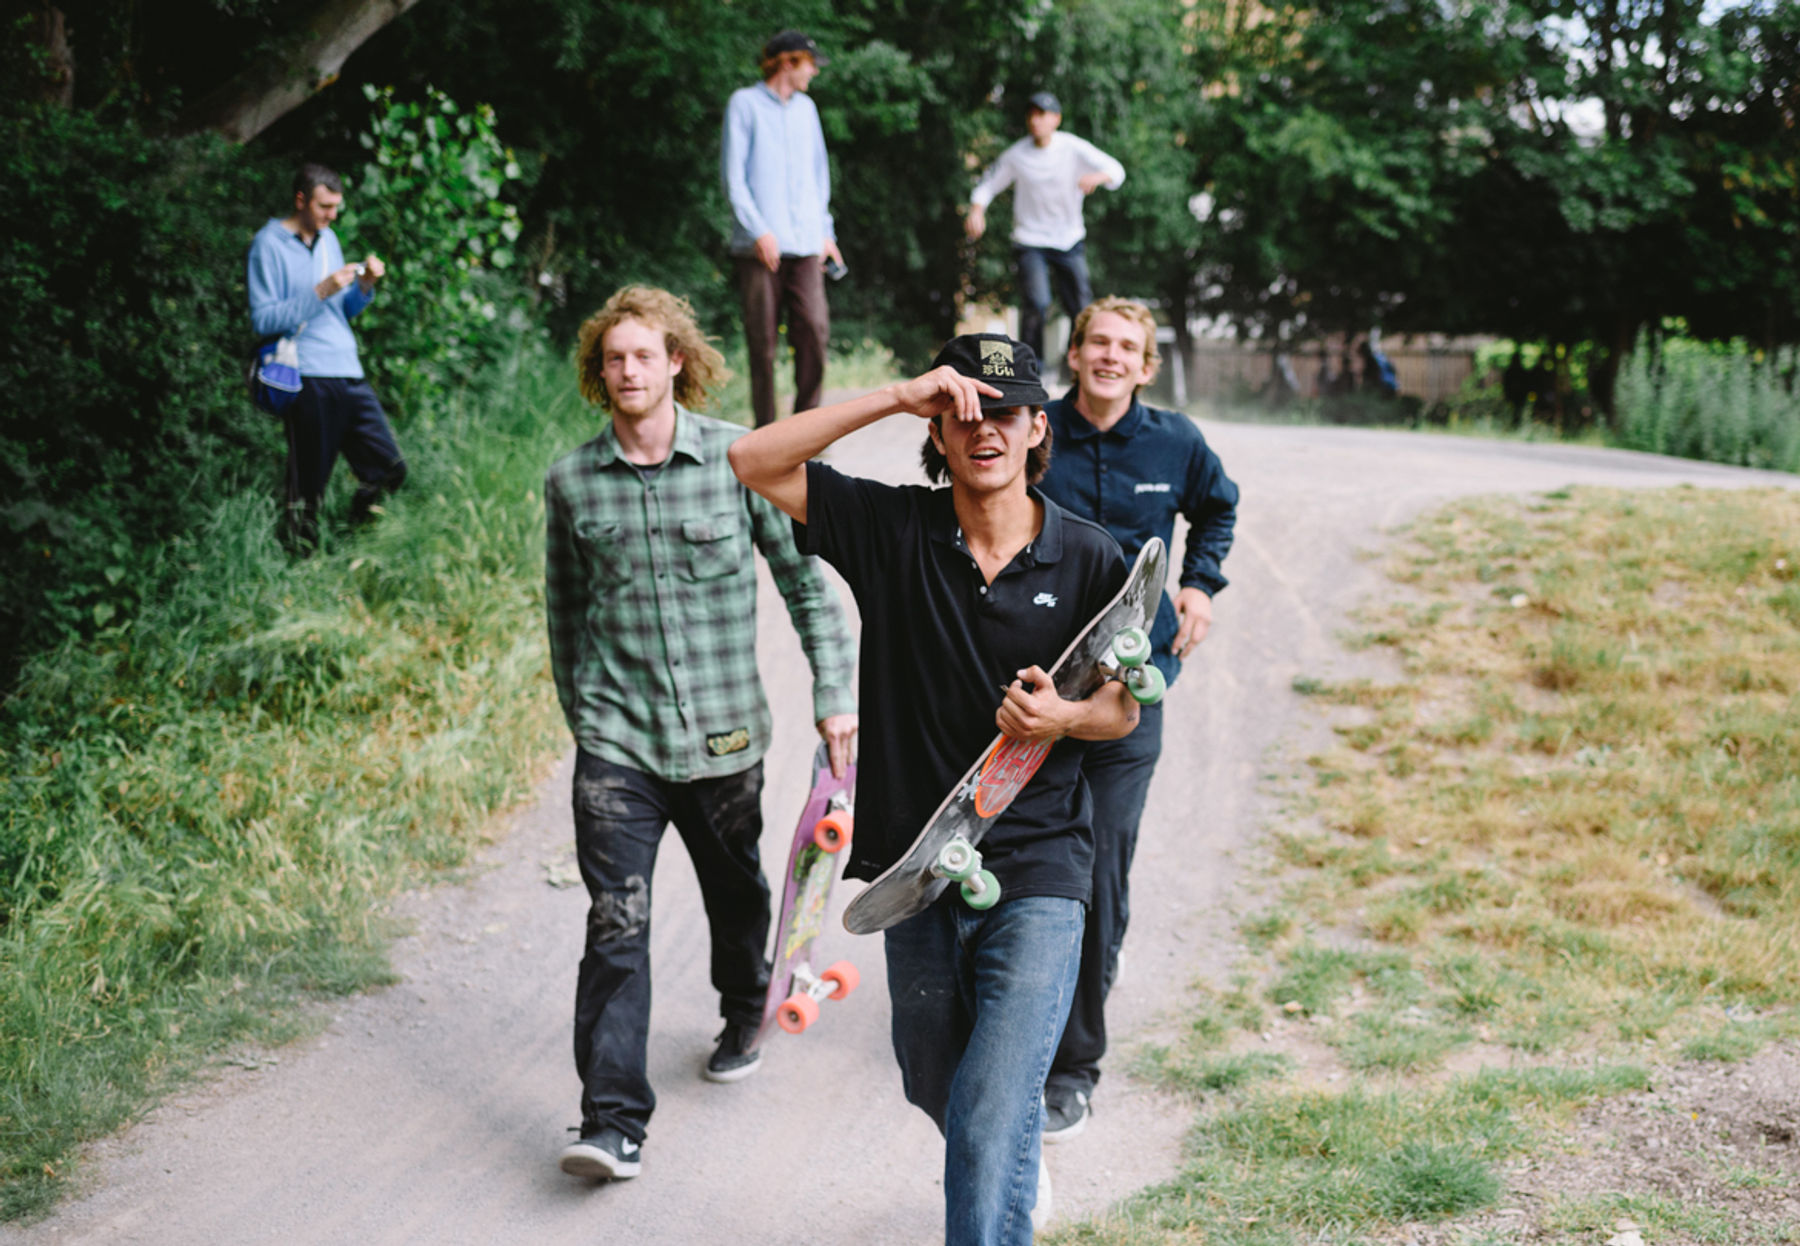 _IHC7829e-Willis-Kimbel-Donovon-Piscopo-John-Fitzgerald-Nike-SB-x-Slam-City-Skates-Go-Skateboarding-Day-London-June-2015-Photographer-Maksim-Kalanep